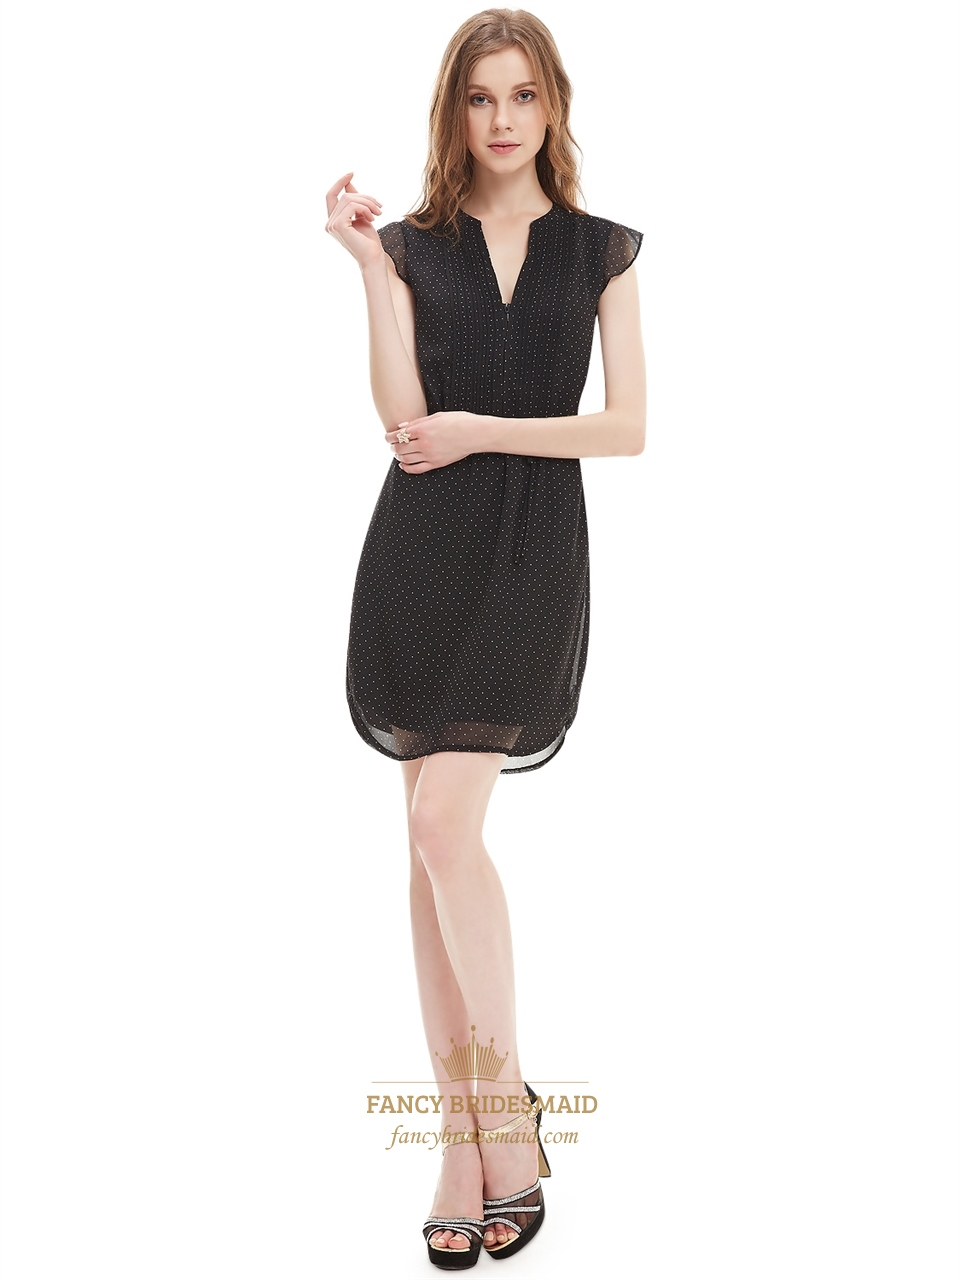 c93838ddb79 Black Chiffon Summer Women s Semi Formal Dresses With Cap Sleeve ...